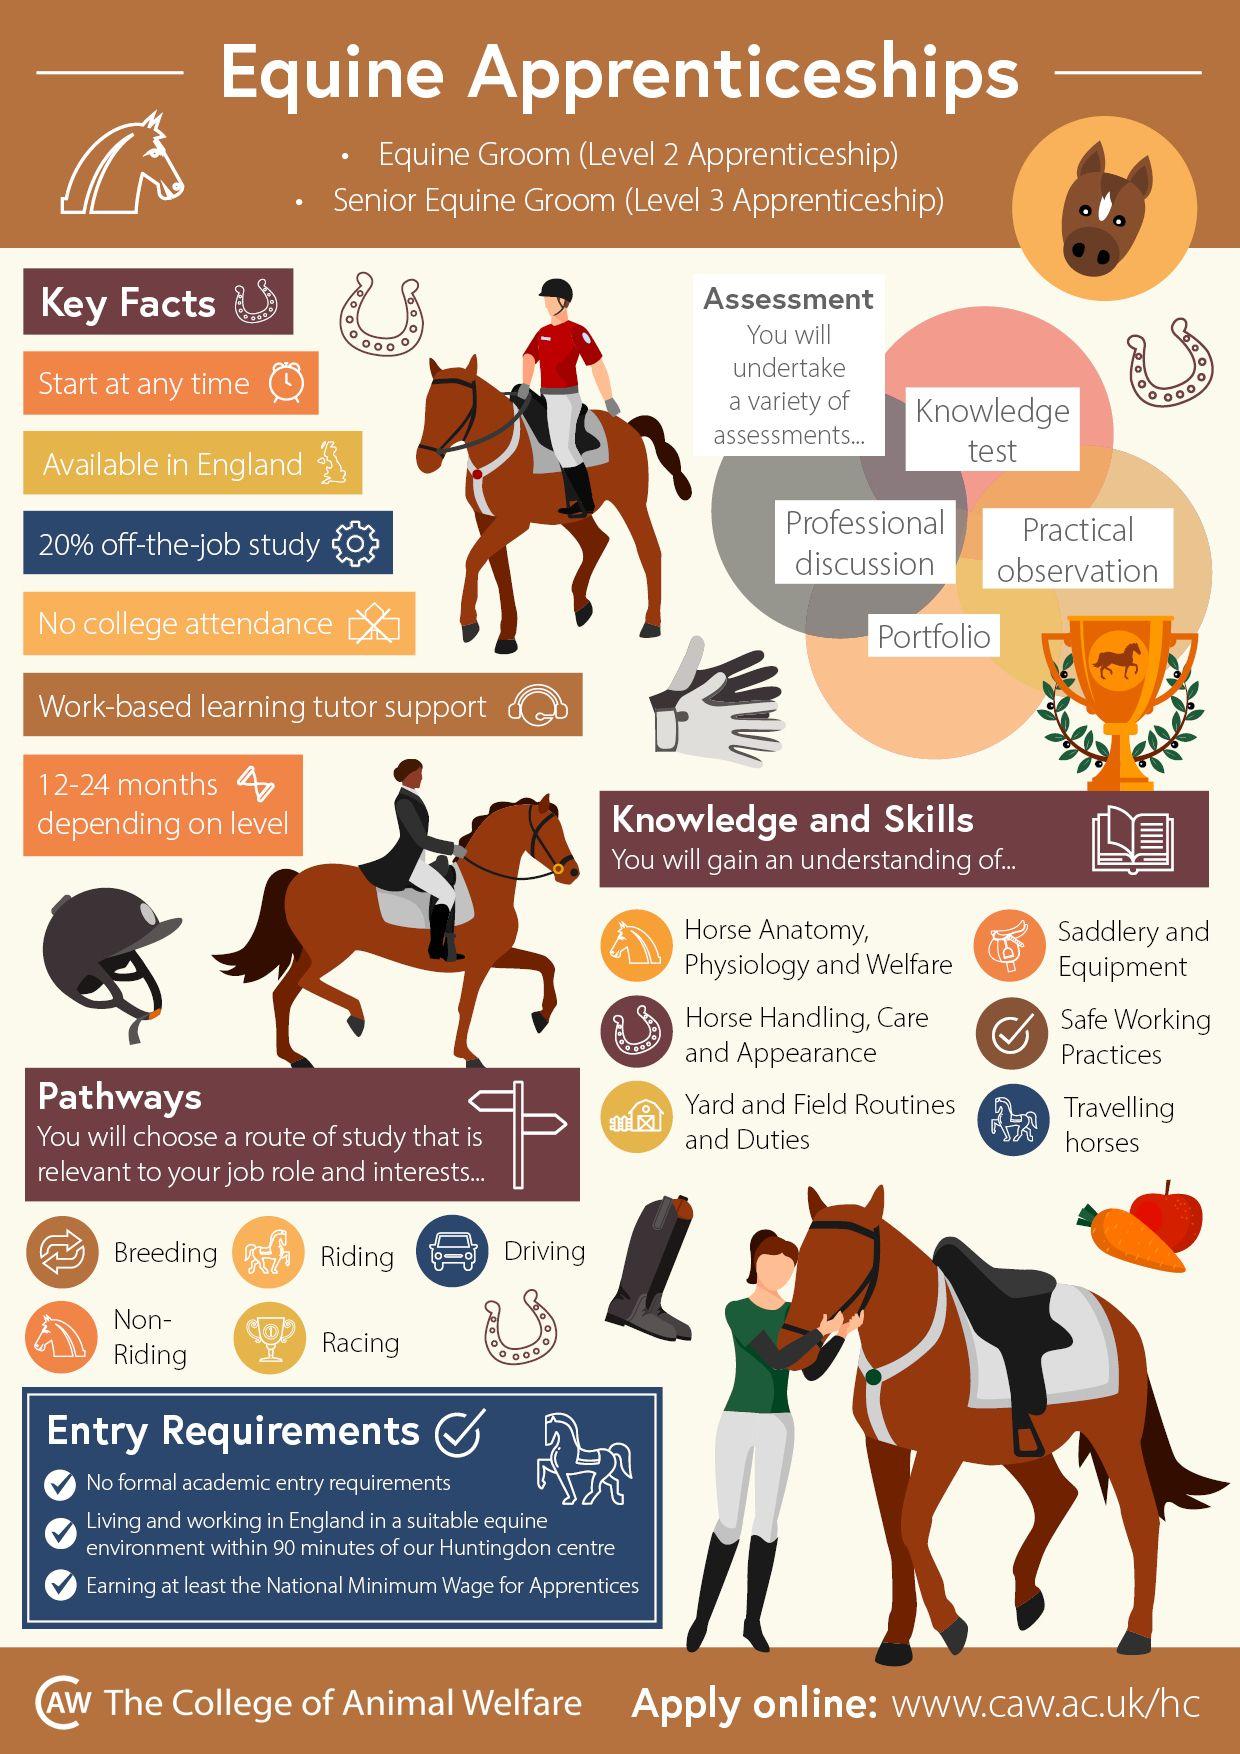 Equine Apprenticeships Infographic In 2020 Horse Care Apprenticeship Horses